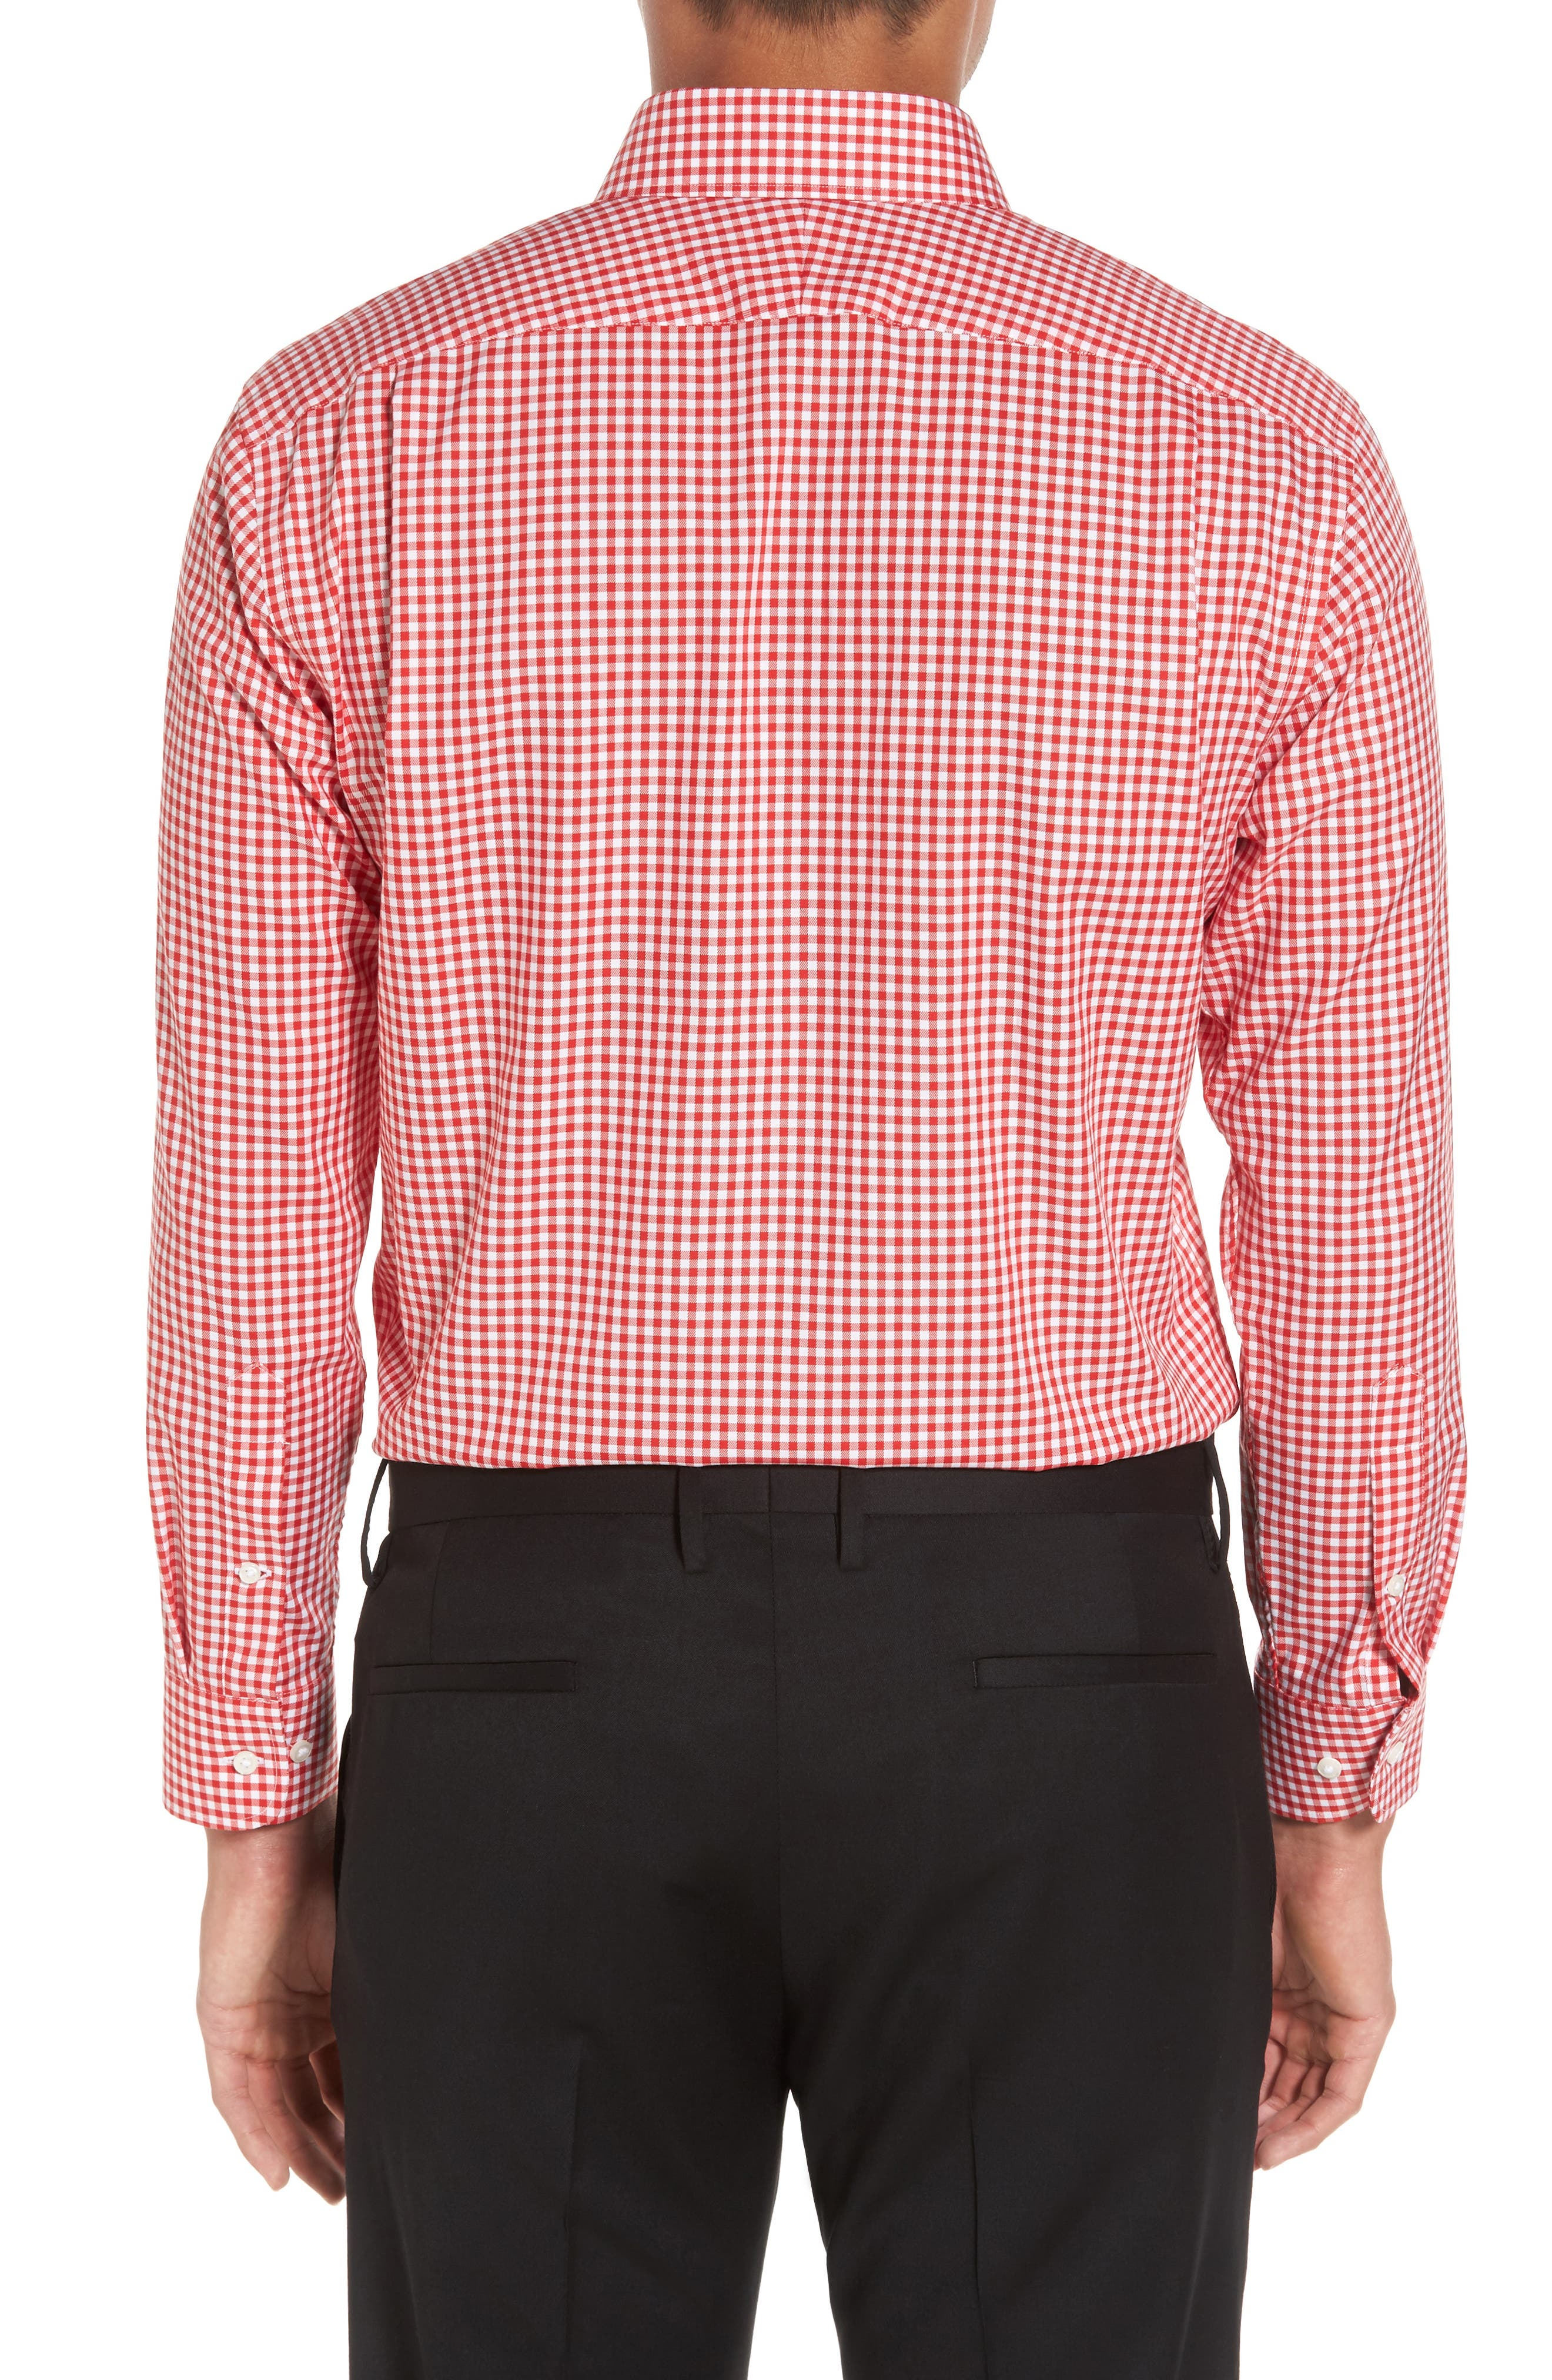 Trim Fit Non-Iron Gingham Dress Shirt,                             Alternate thumbnail 2, color,                             Red Blaze